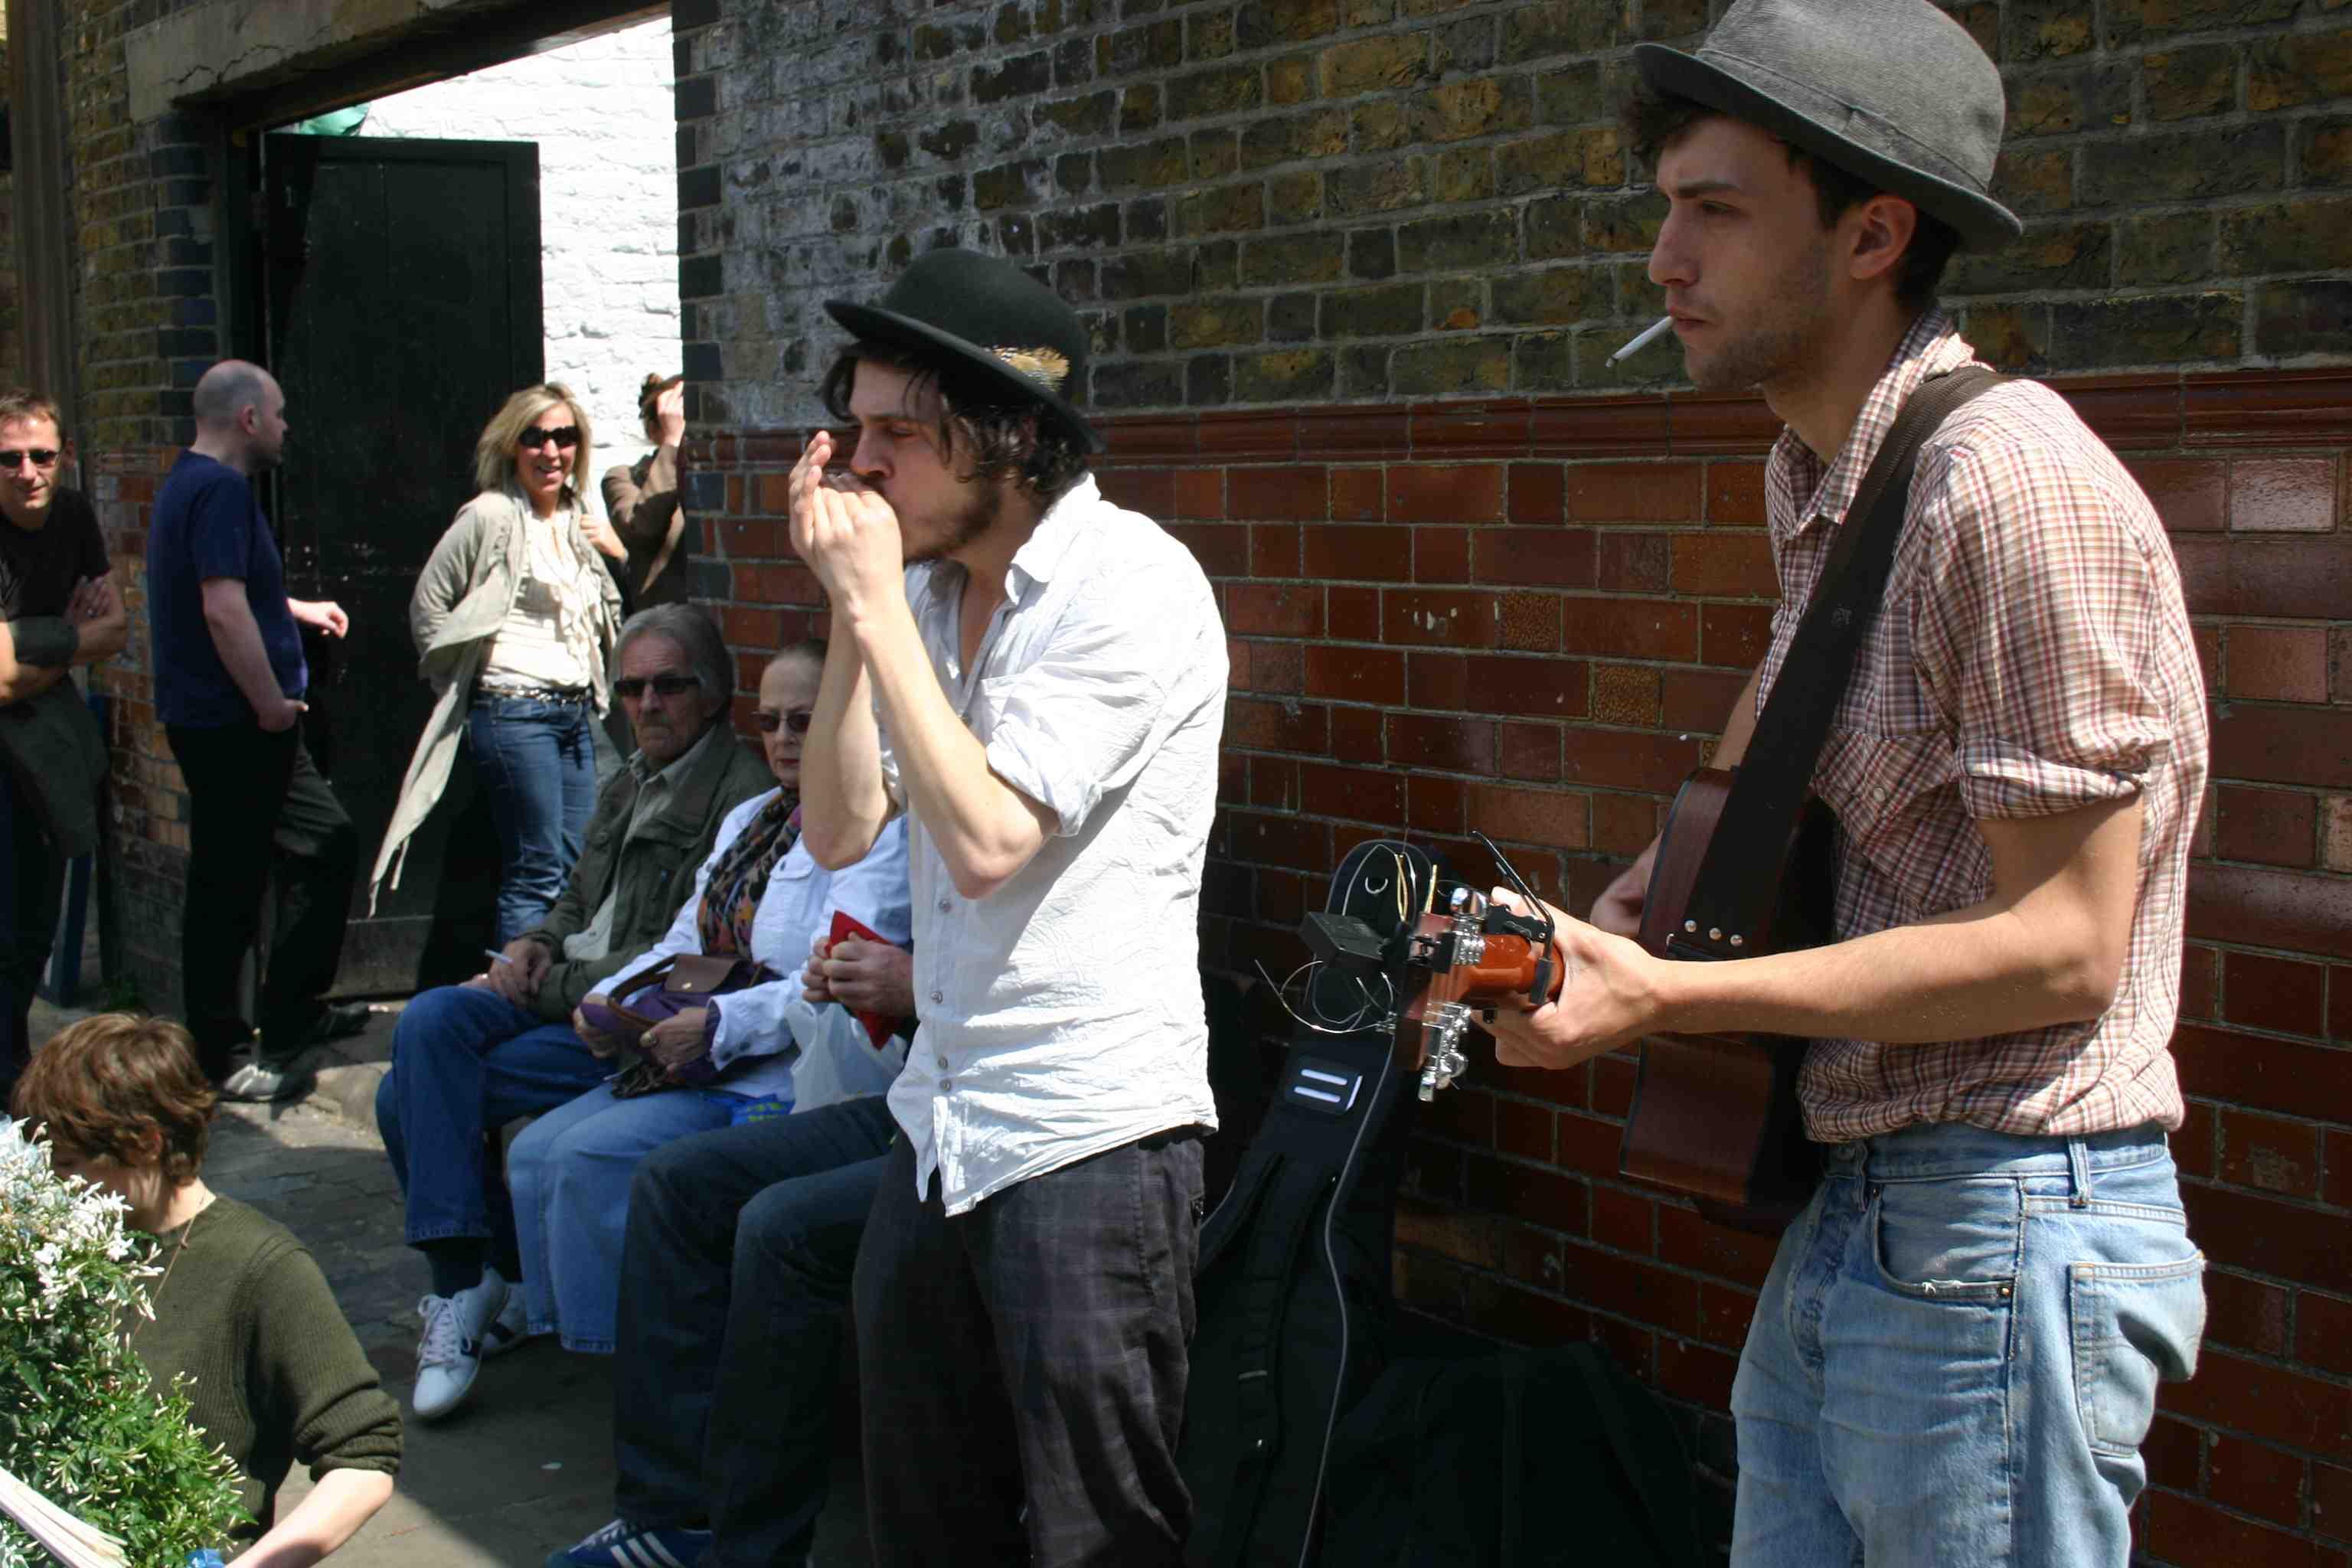 Straßenmusiker in Hackney am Blumenmarkt